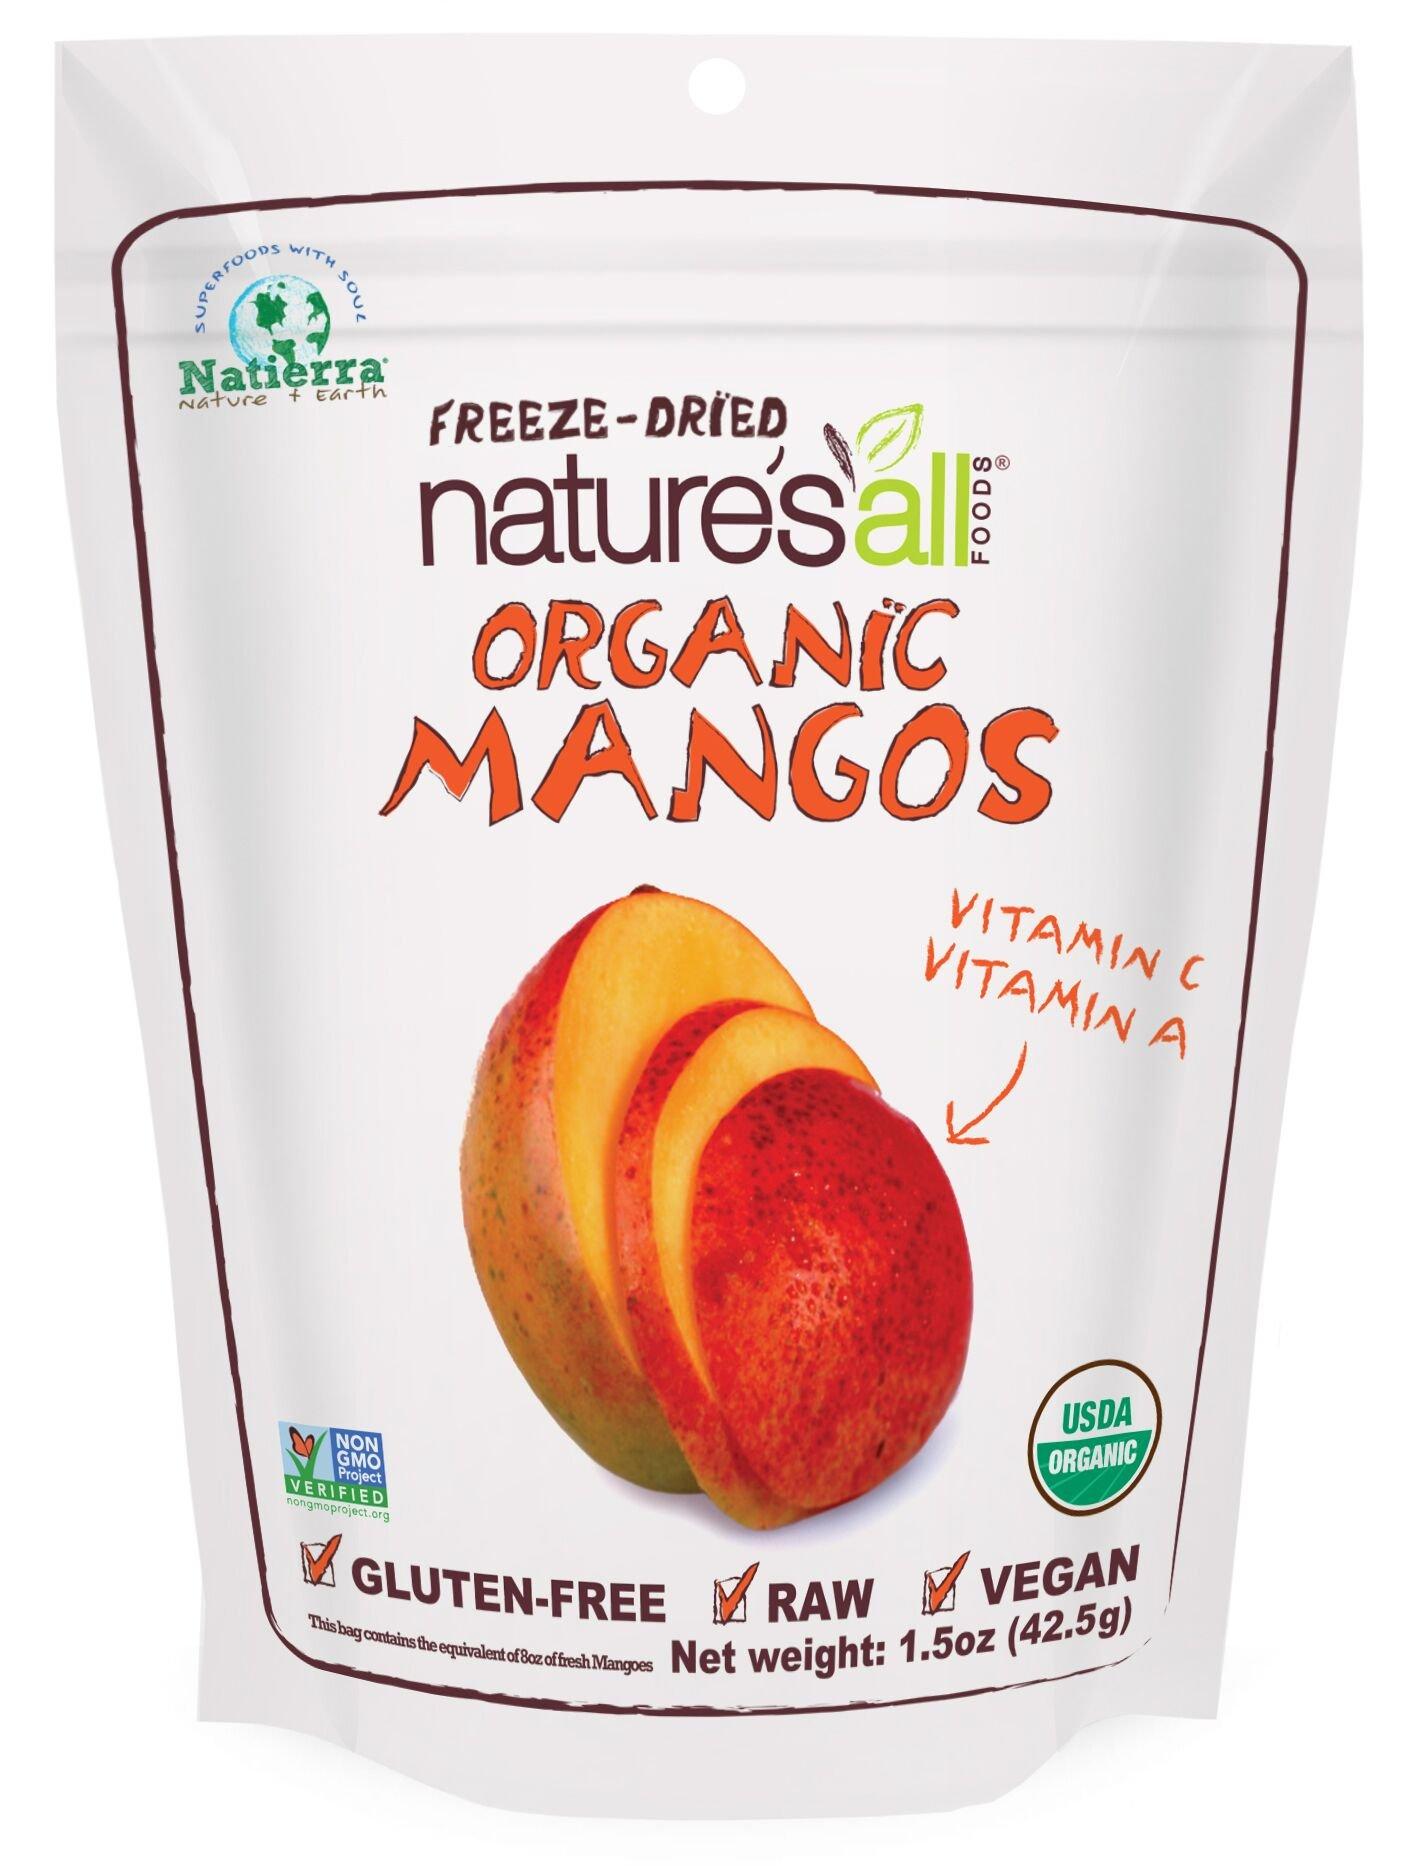 Natierra Nature's All Foods Organic Freeze-Dried Mangos, 1.5 Ounce